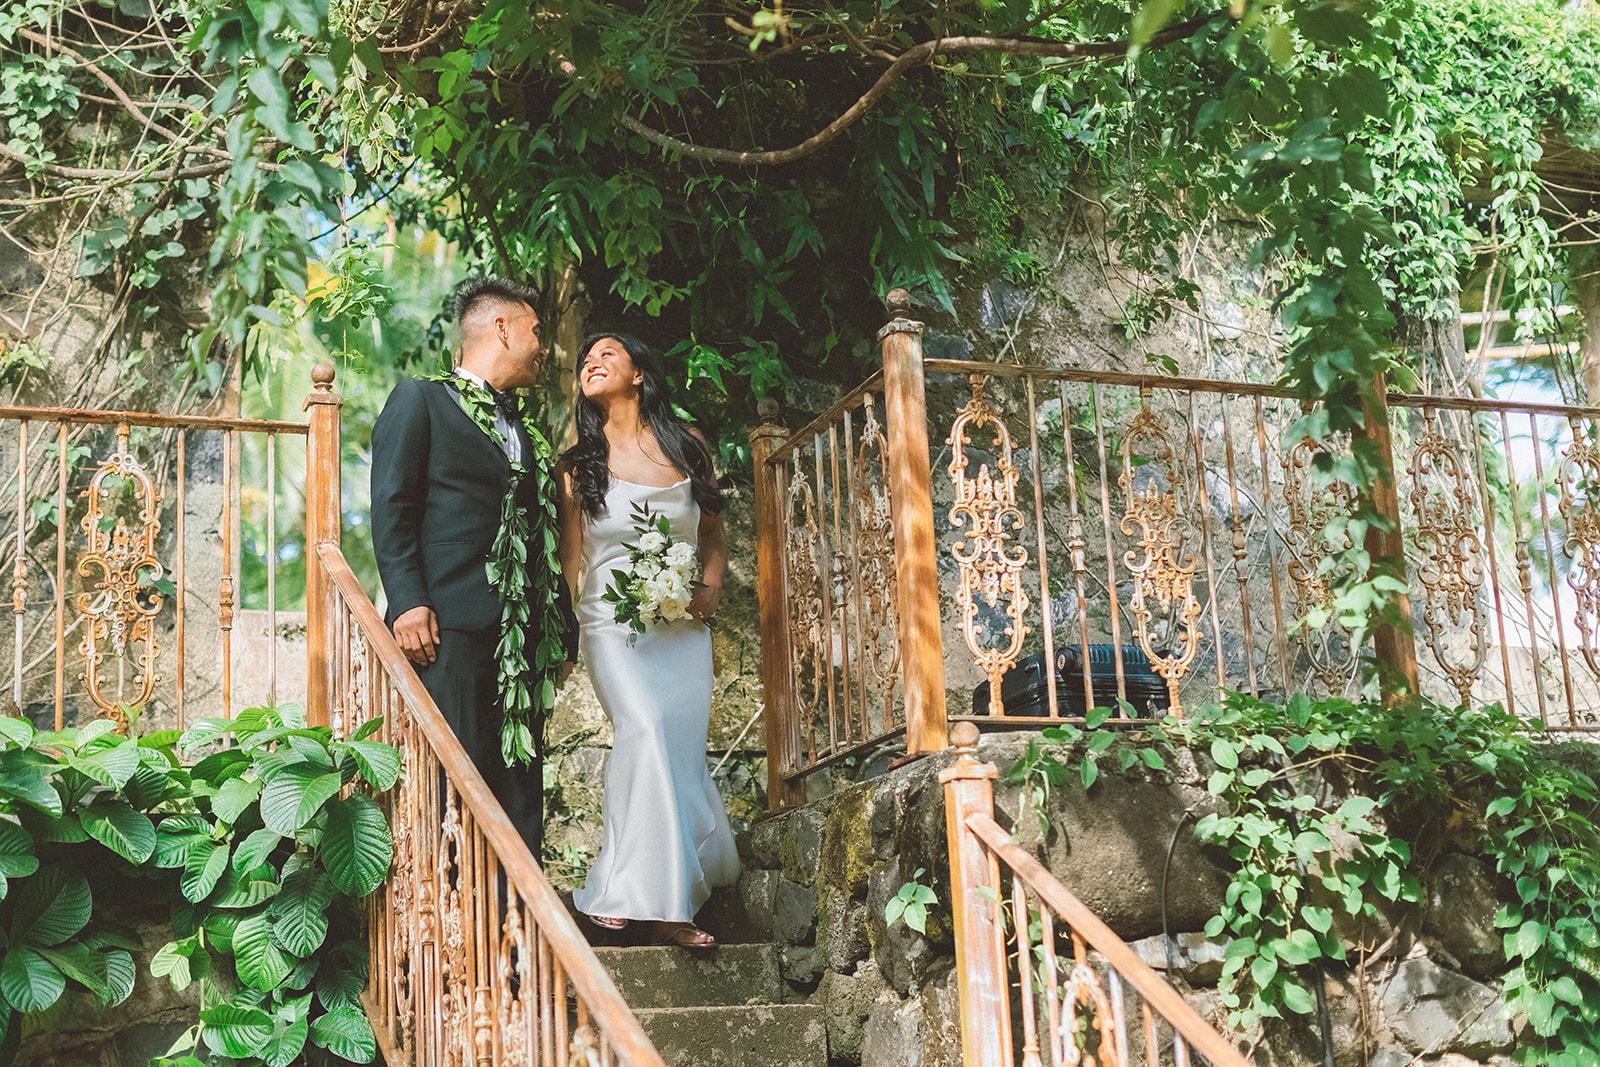 Haiku Mill Luxe Maui Wedding20190625_0265.jpg